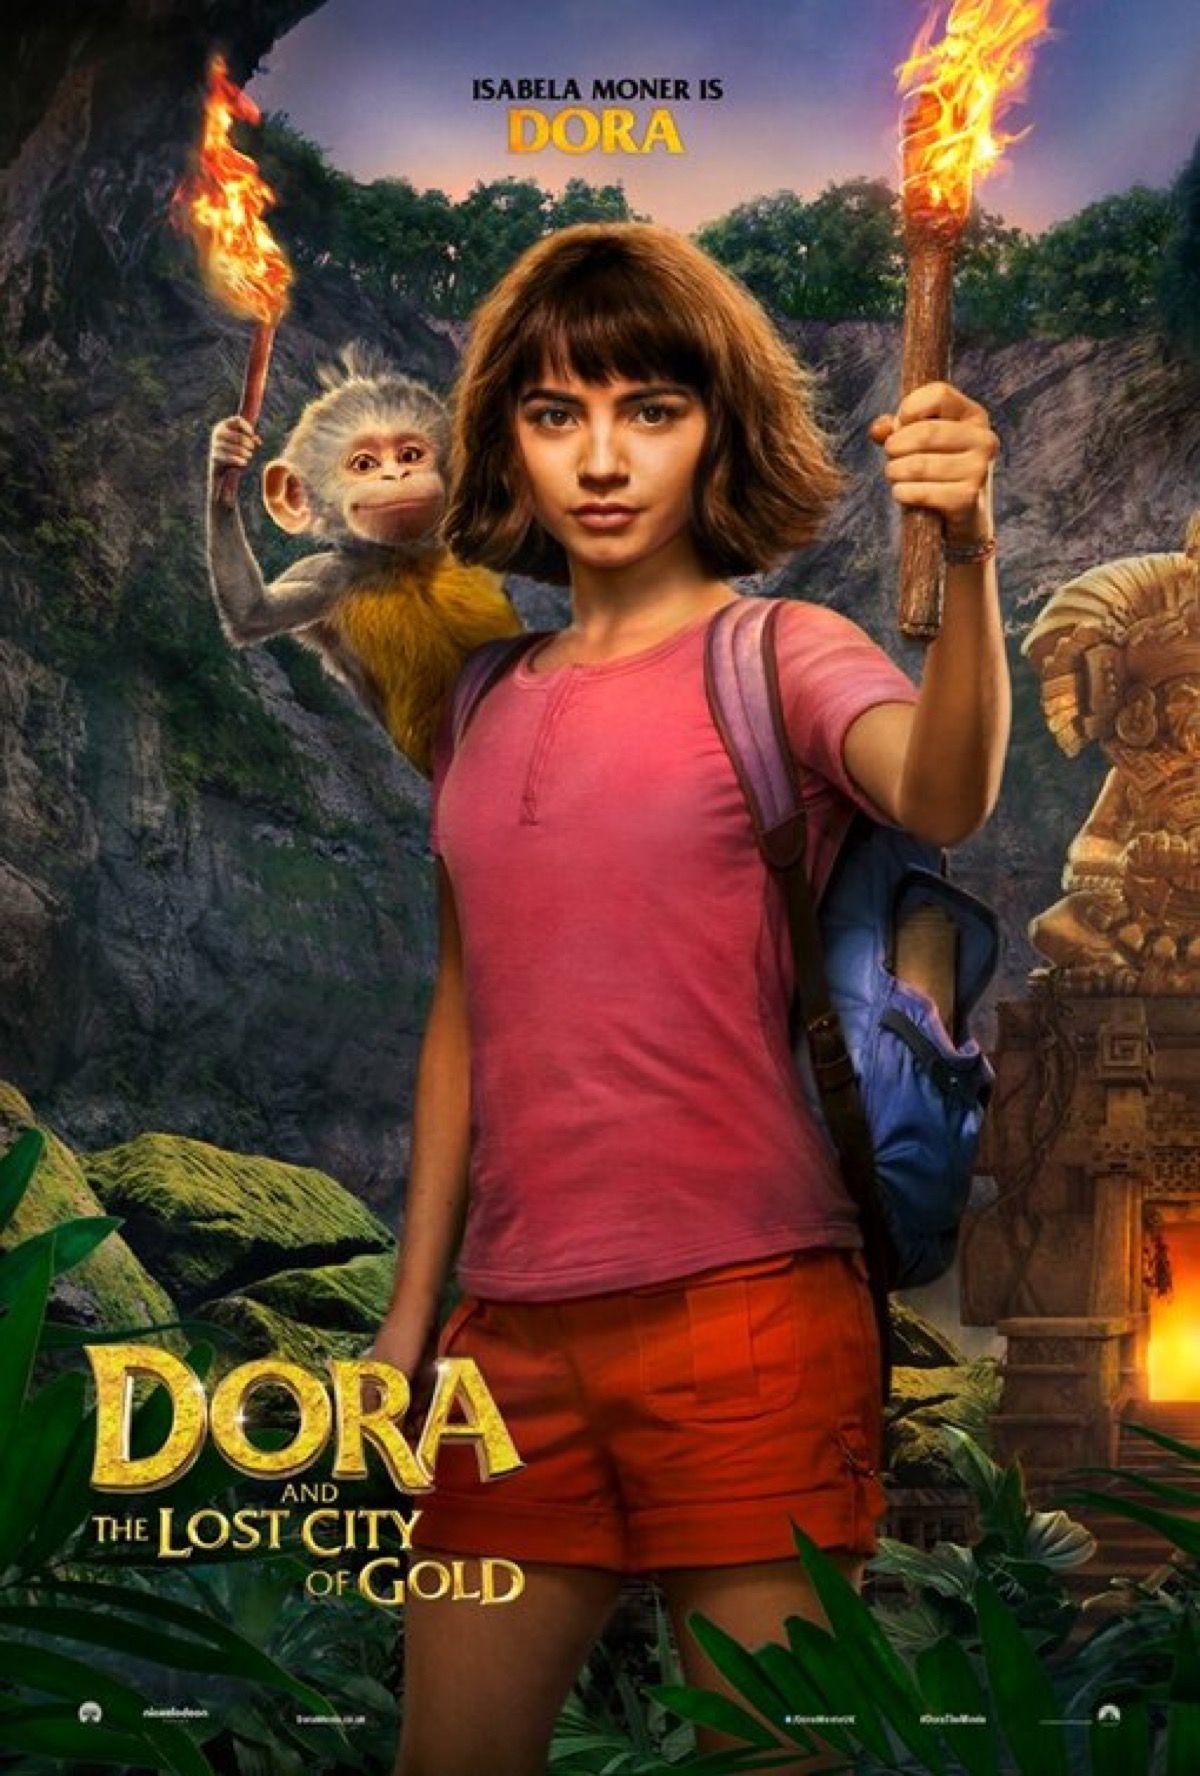 Dora E A Cidade Perdida : cidade, perdida, Gold:, Adventure, Begins, Young, Explorer, Comes, Screen, (Promo), Gold,, City,, Movie